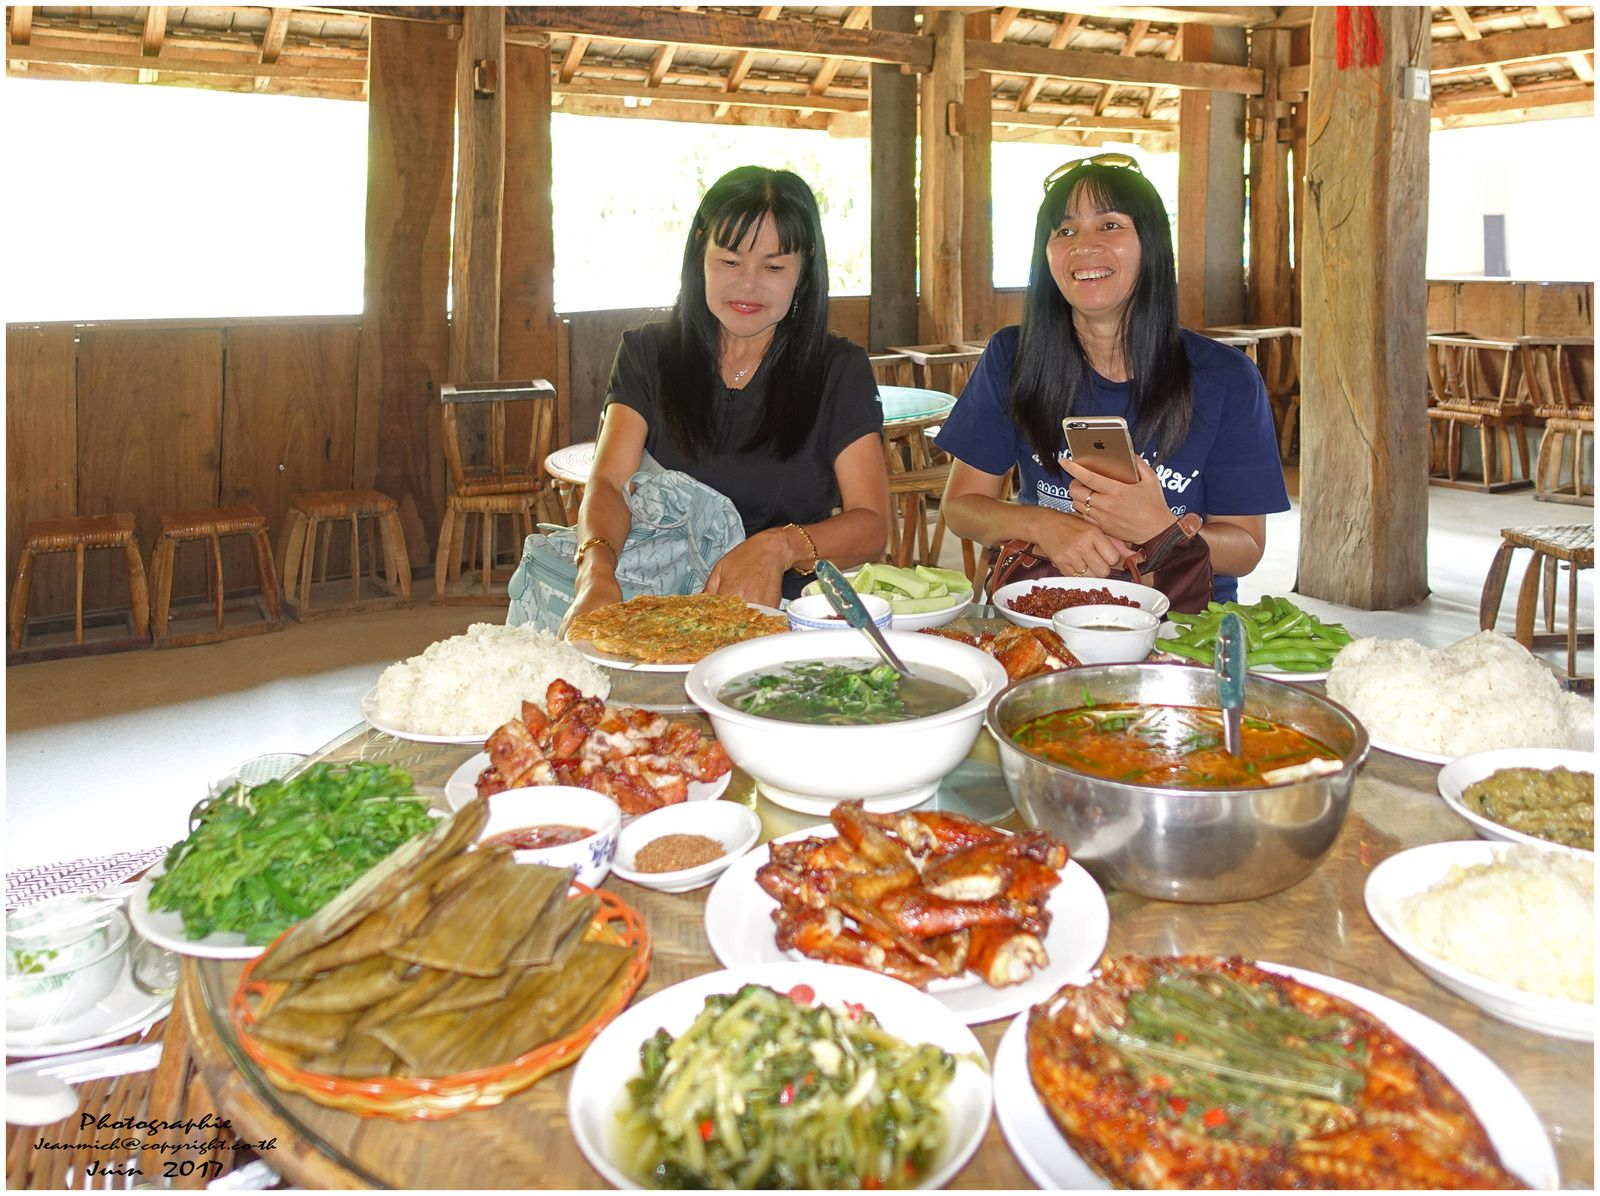 Repas typique Thaï en Chine....